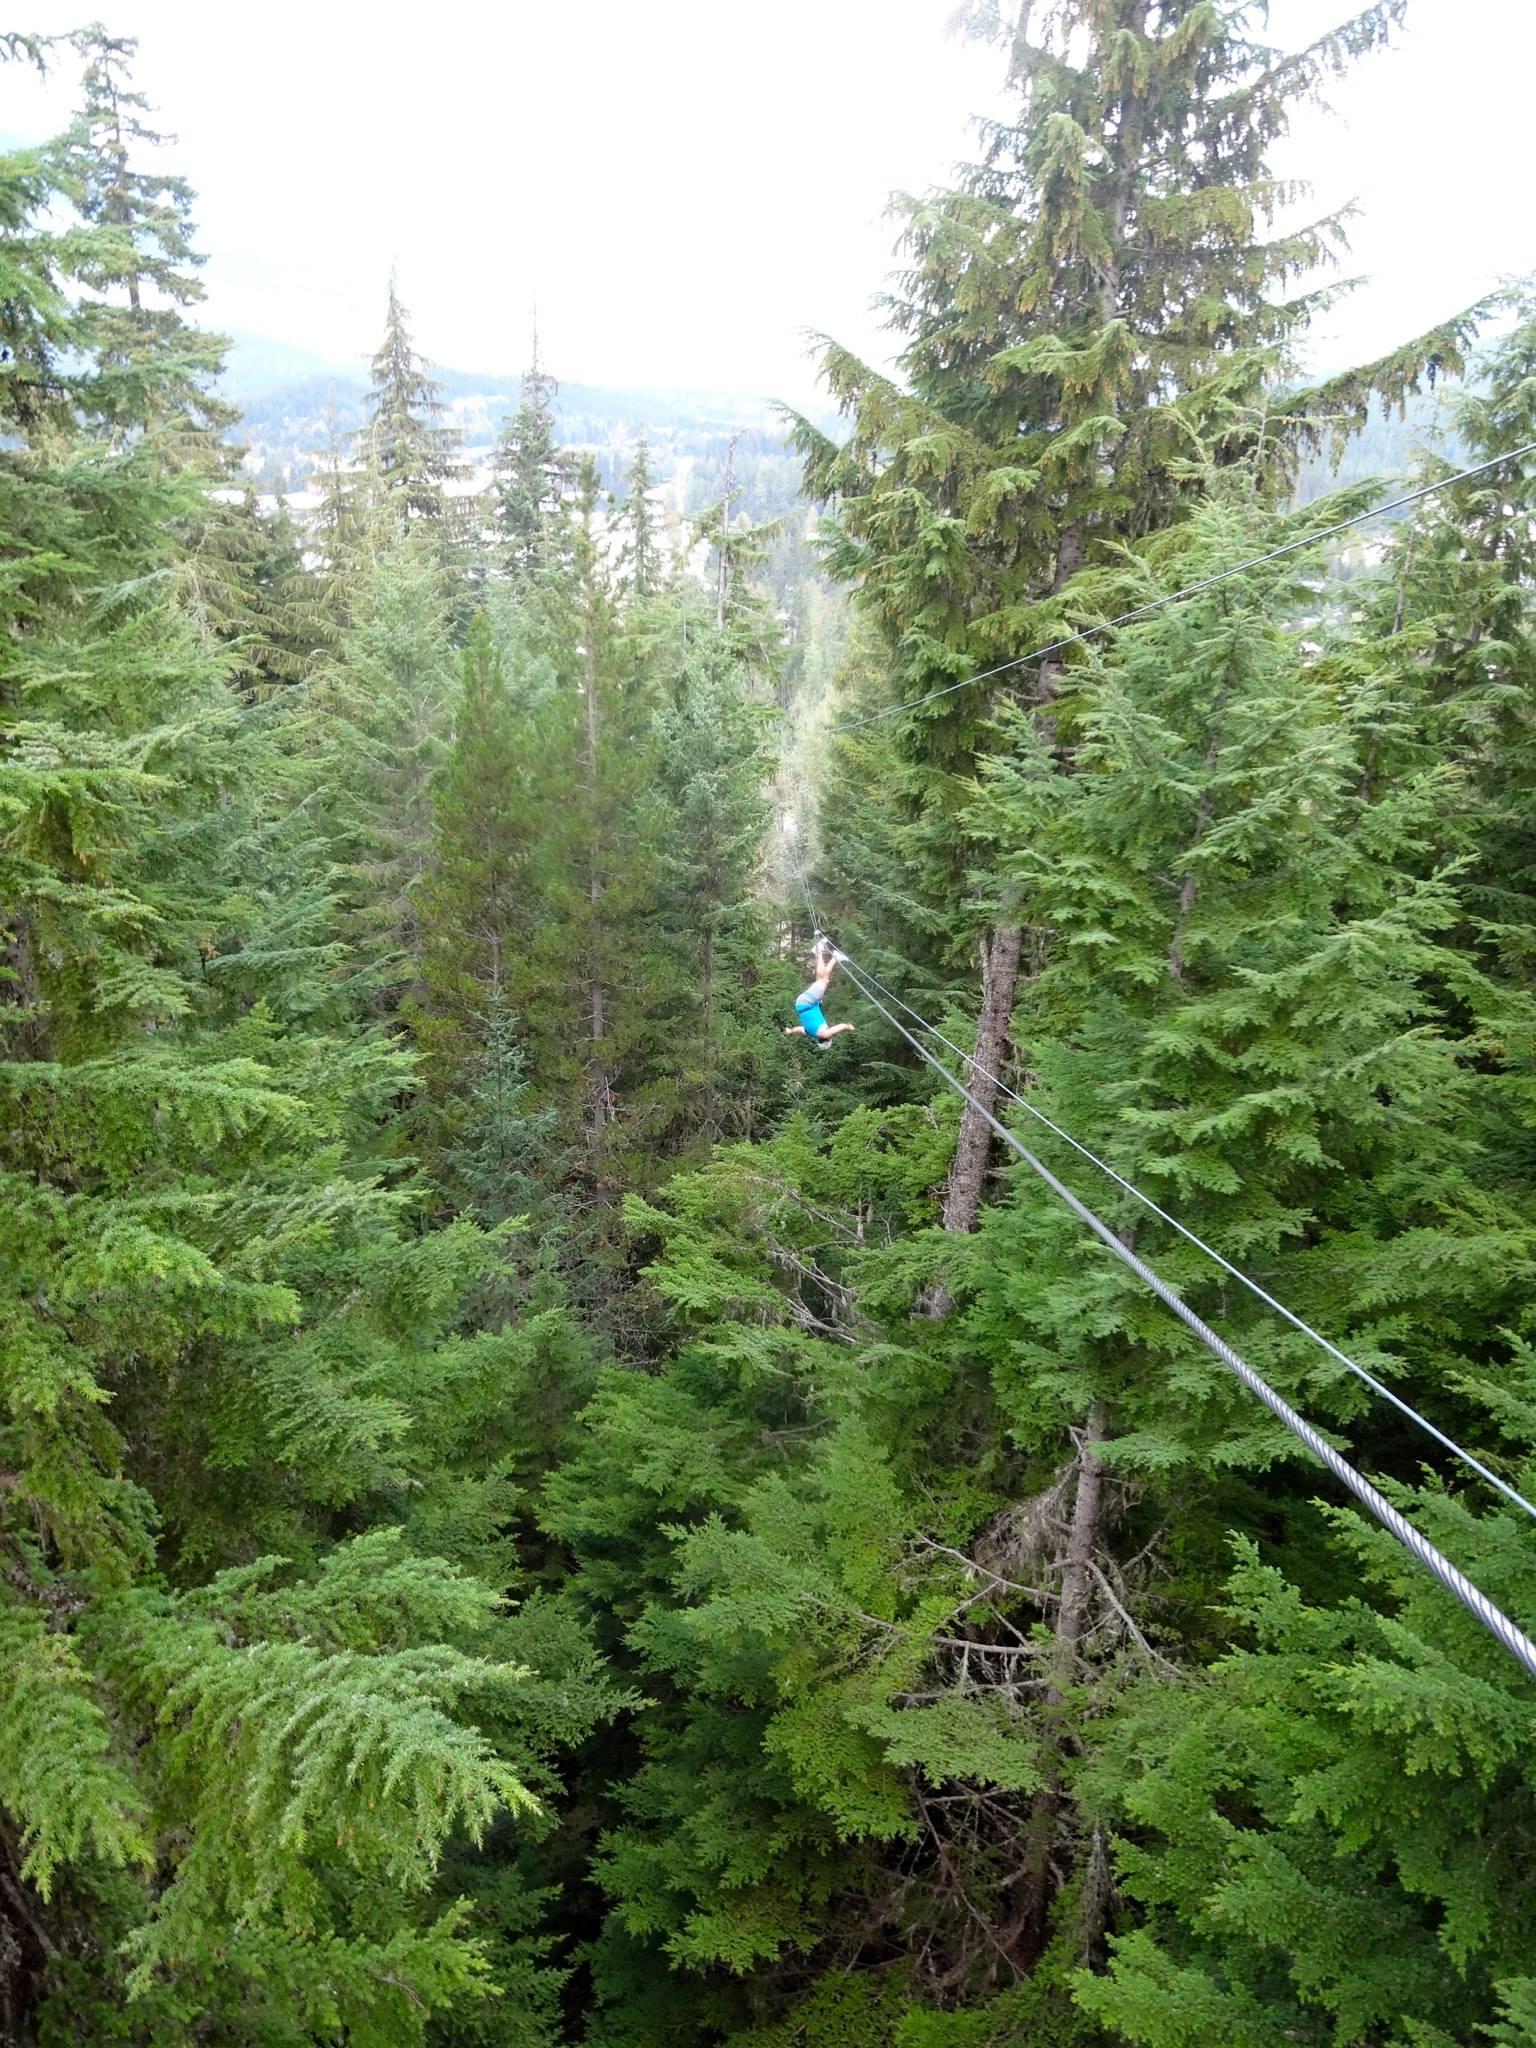 Person on zipline over trees